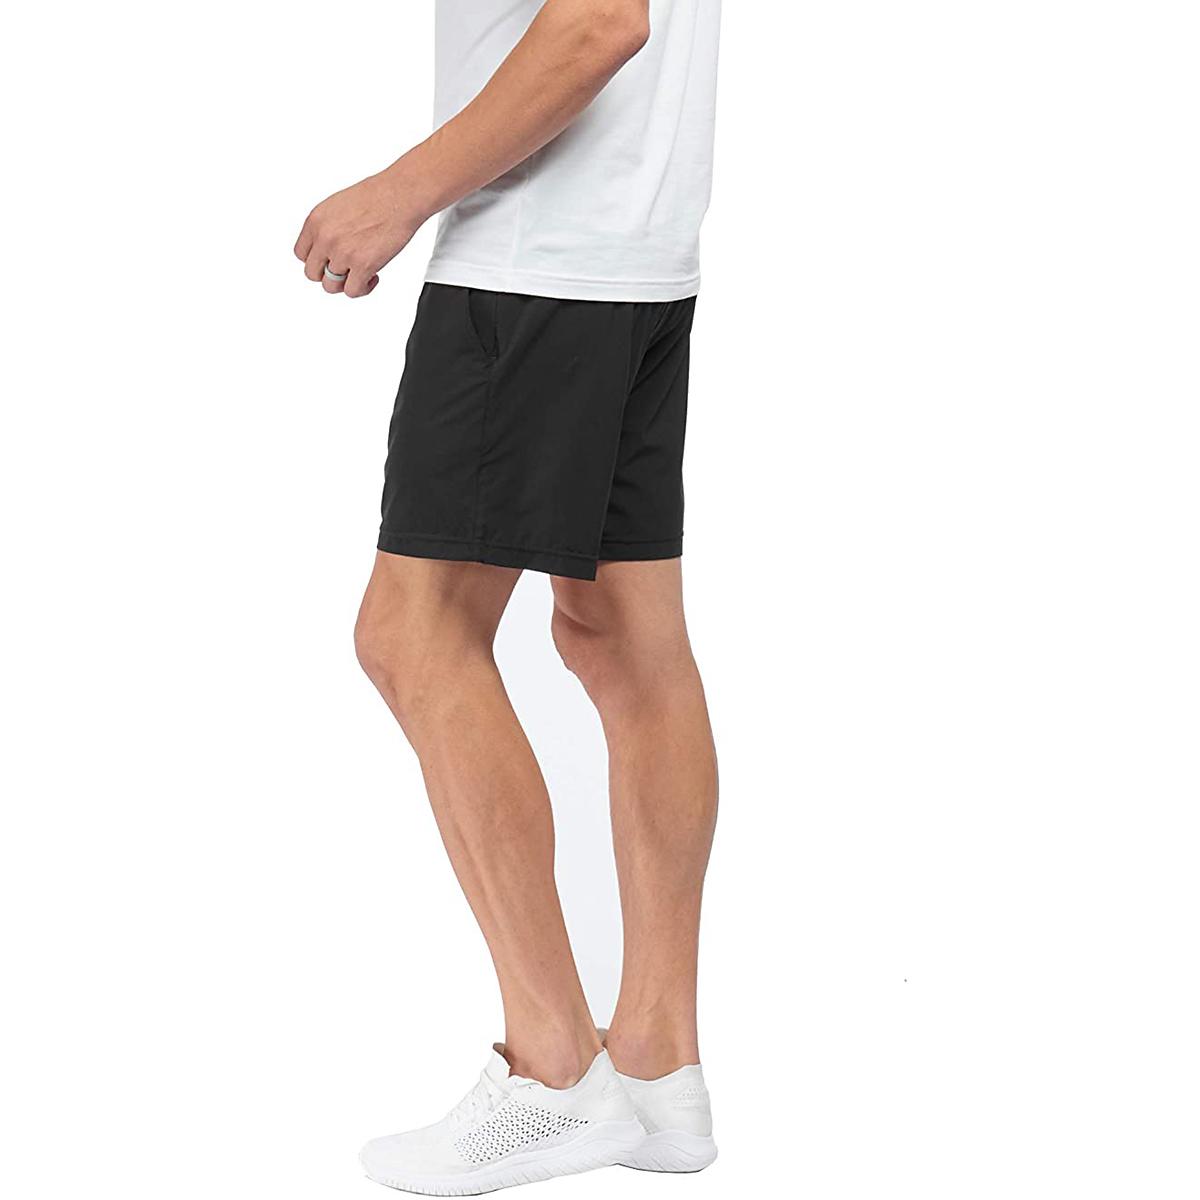 "Men's Rhone 7"" Mako Lined Short, , large, image 2"